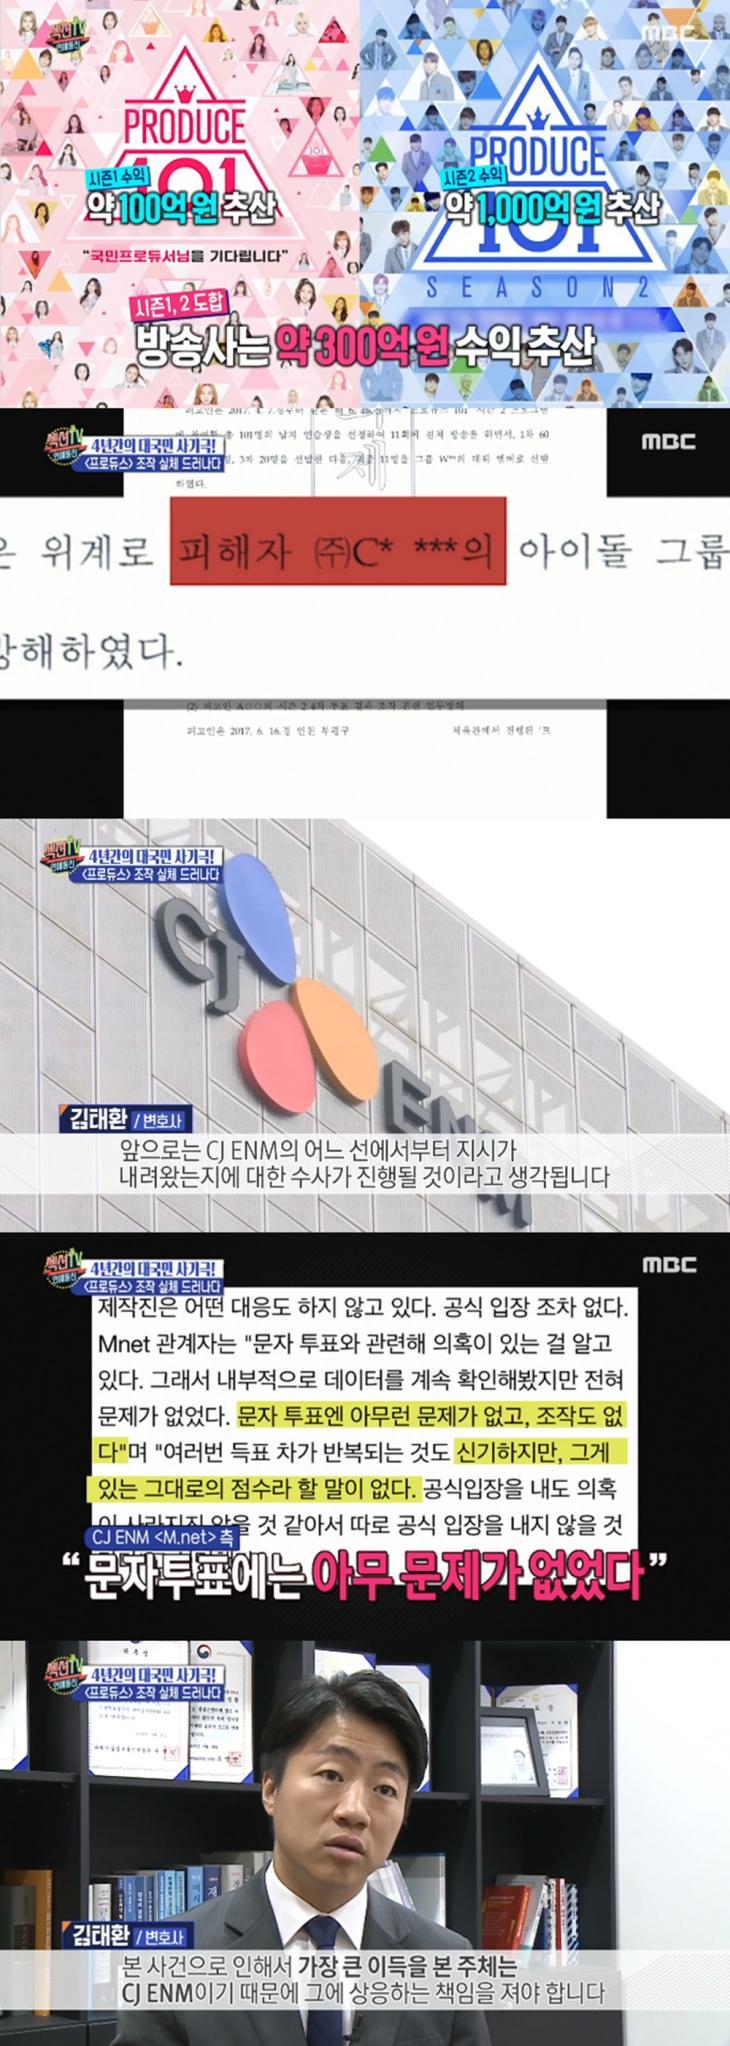 MBC '섹센TV 연예통신' 방송 캡처